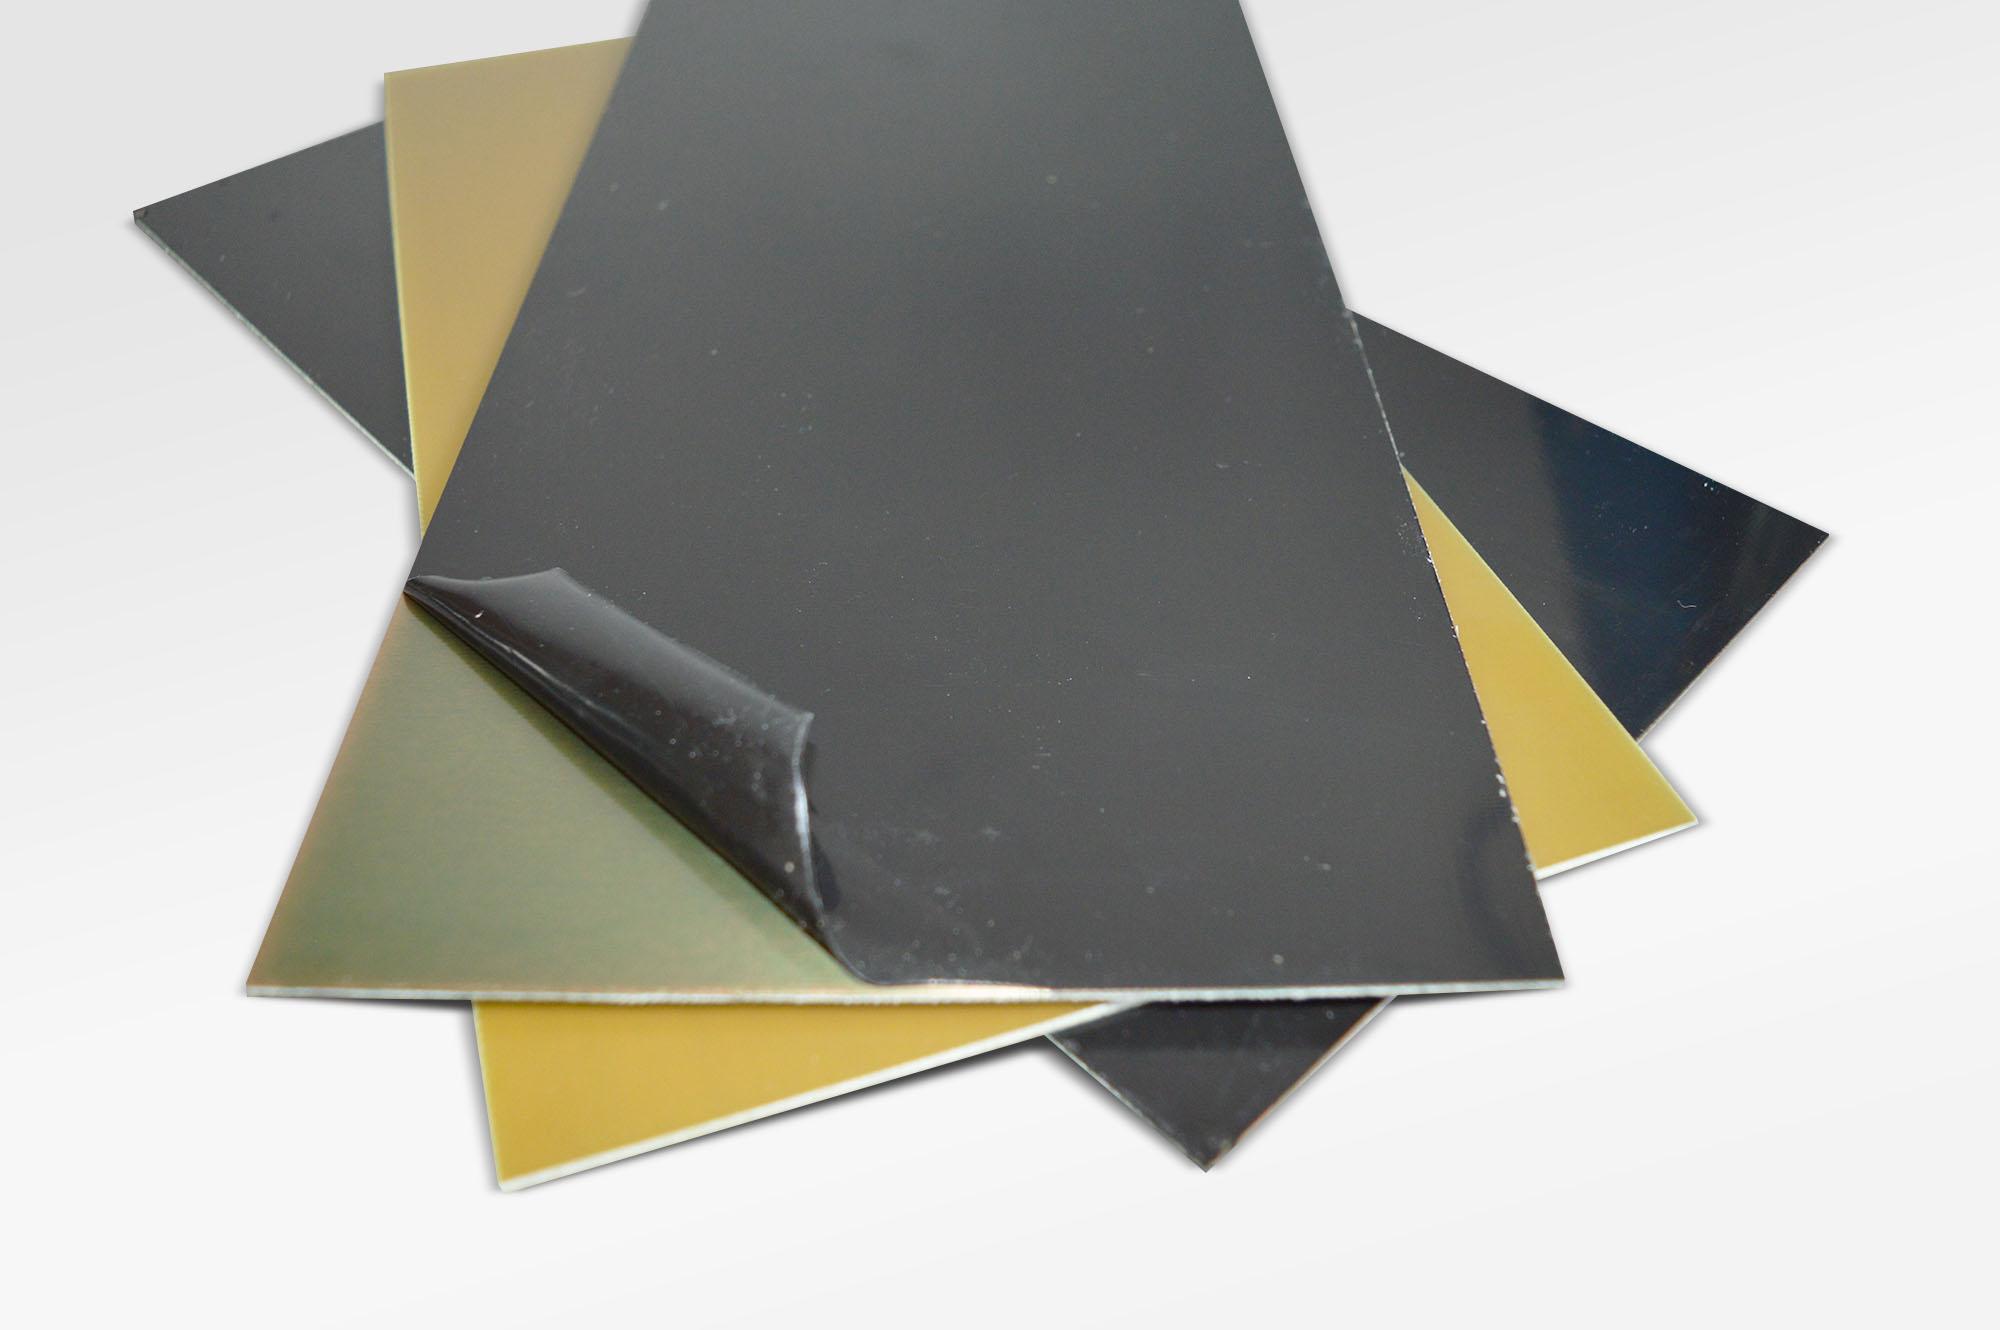 Fortex Fr4 Fotoboard Presensitised Copper Clad Circuit Board Eletronic Printed Design Buy Pre Sensitized Photoresist Pcb Laminate